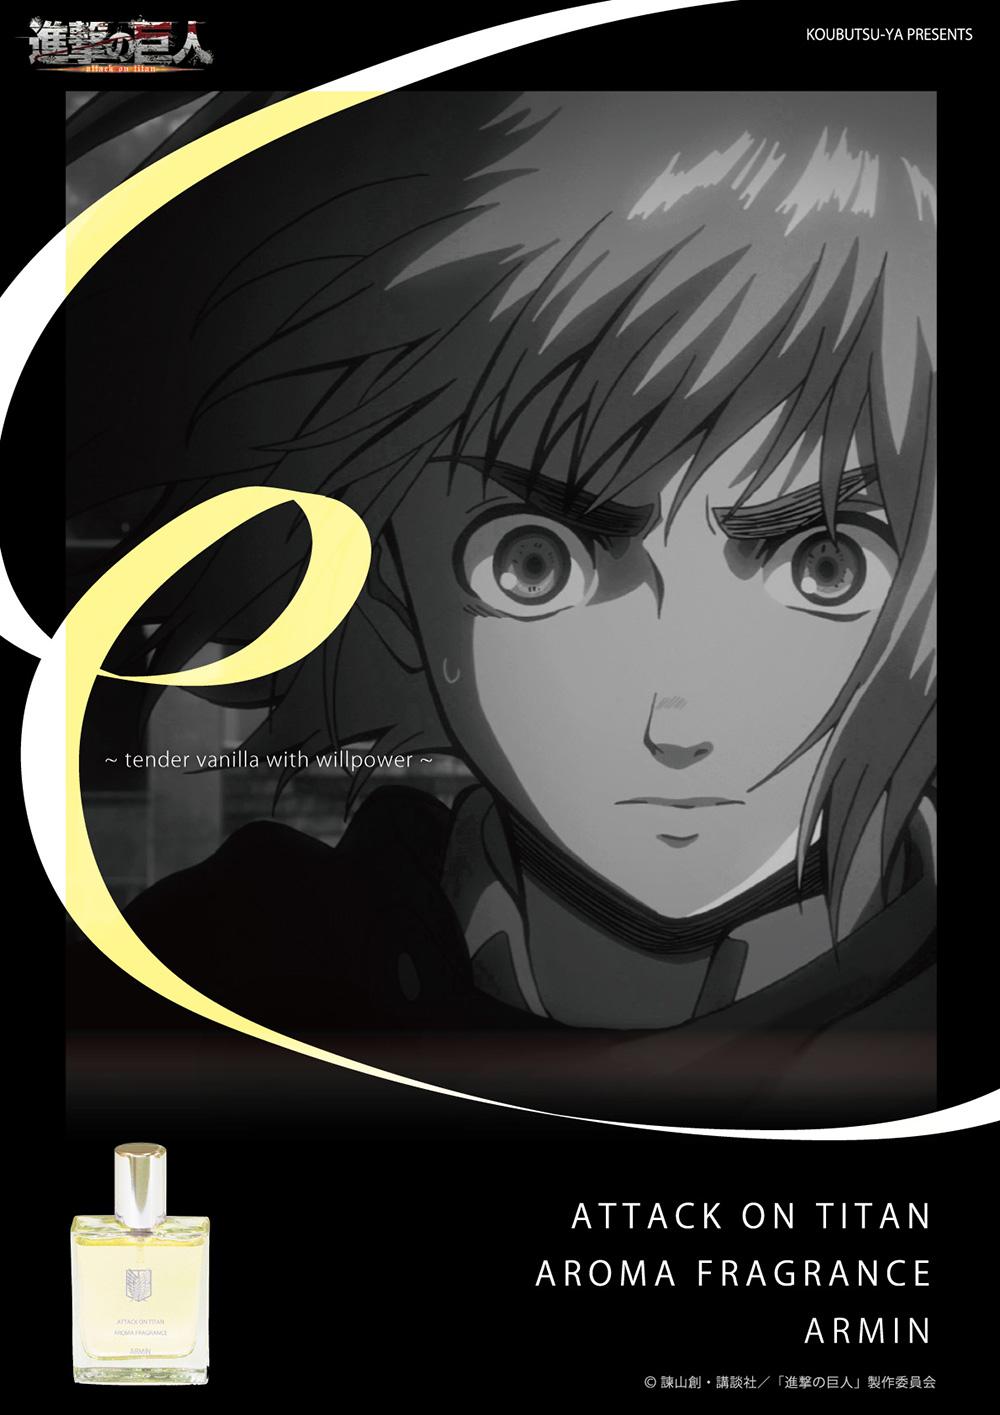 Attack-on-Titan-Aroma-Fragrance-Armin